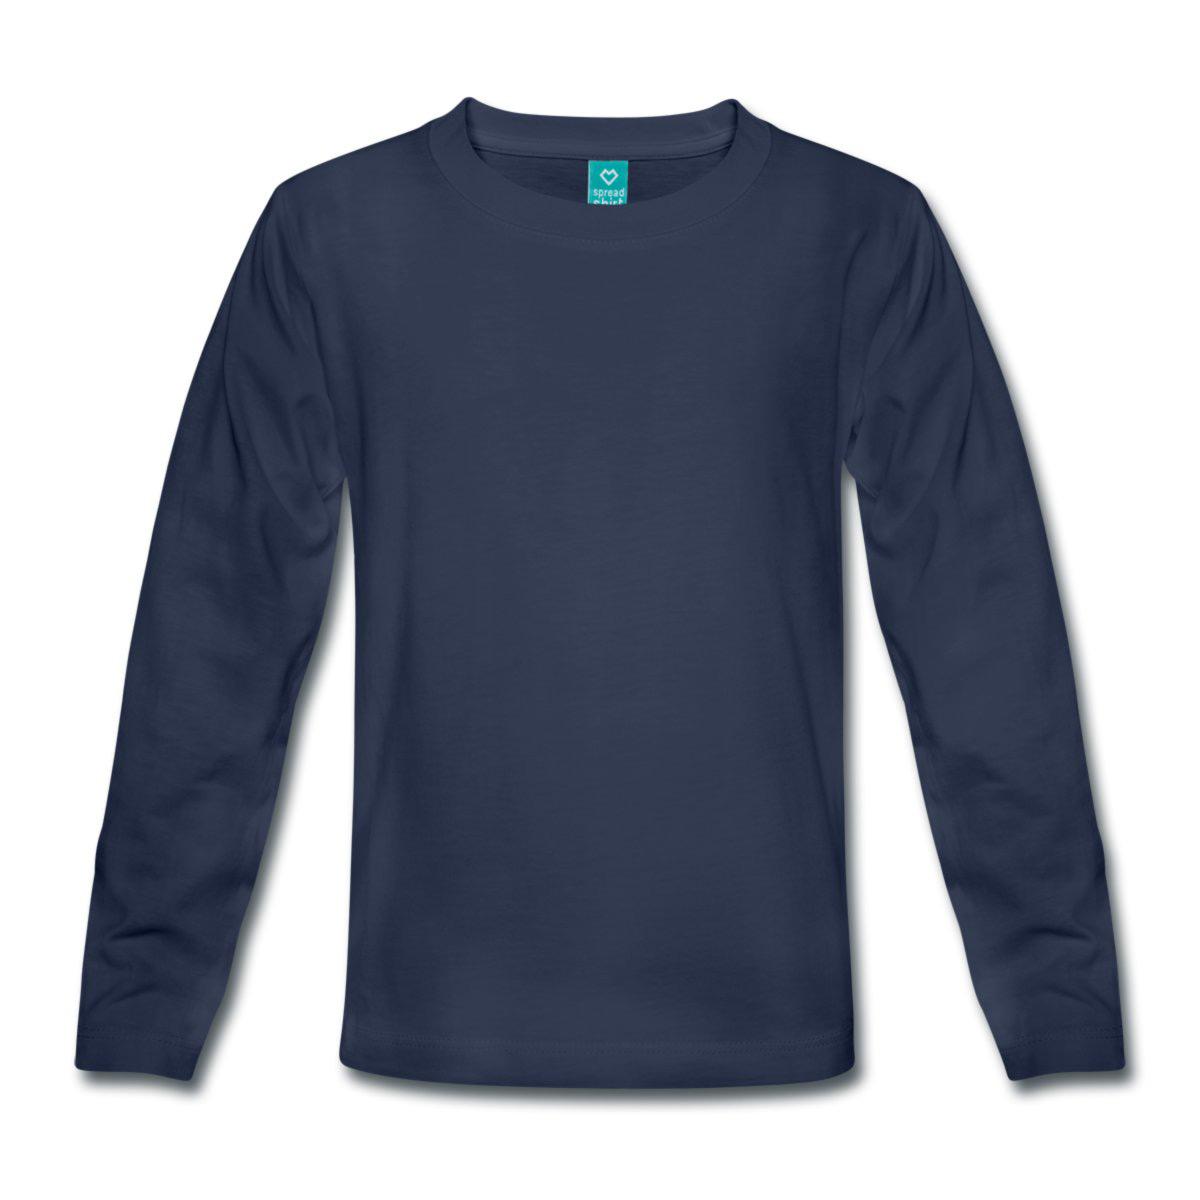 Wholesale Langarmshirt günstig, zulegen Langarmshirt online. NC-Staff: Dear sir/madam, thank you for your order. For every size, there is a corresponding .